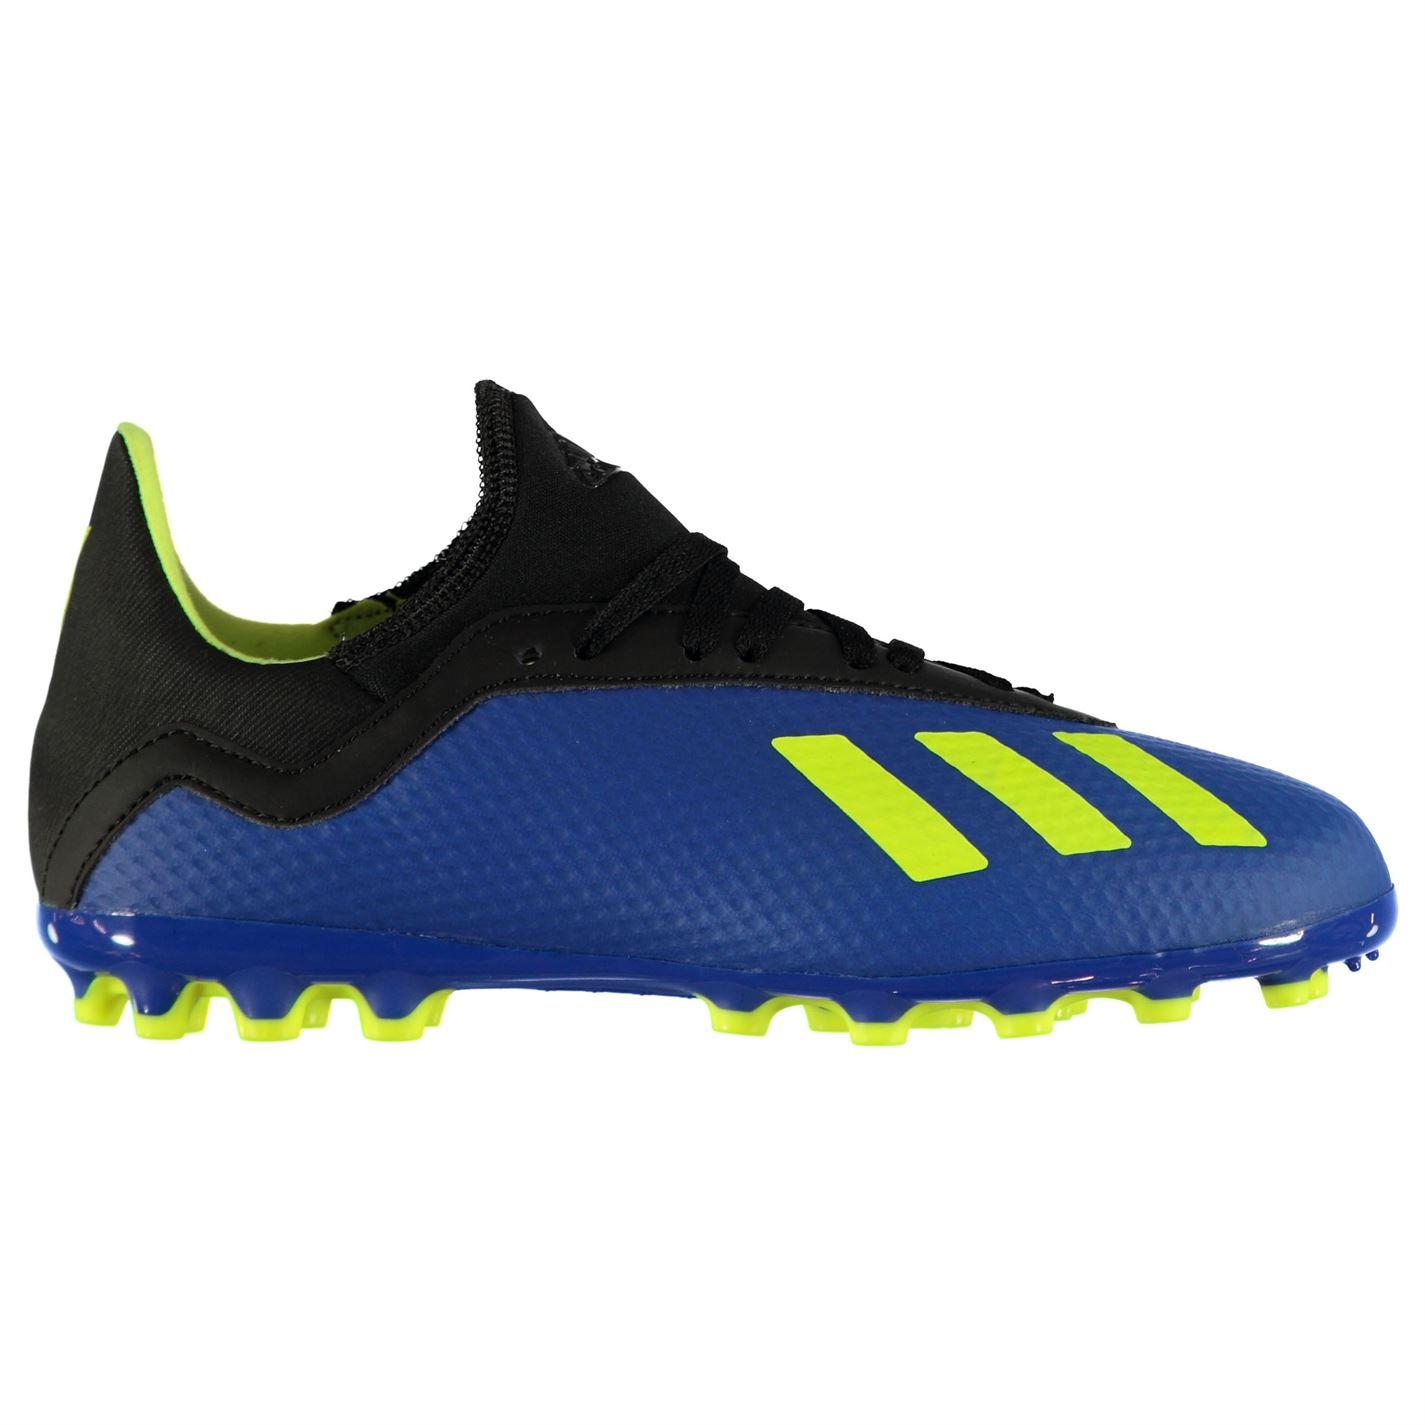 Adidas X 18.3 Childrens AG Football Boots